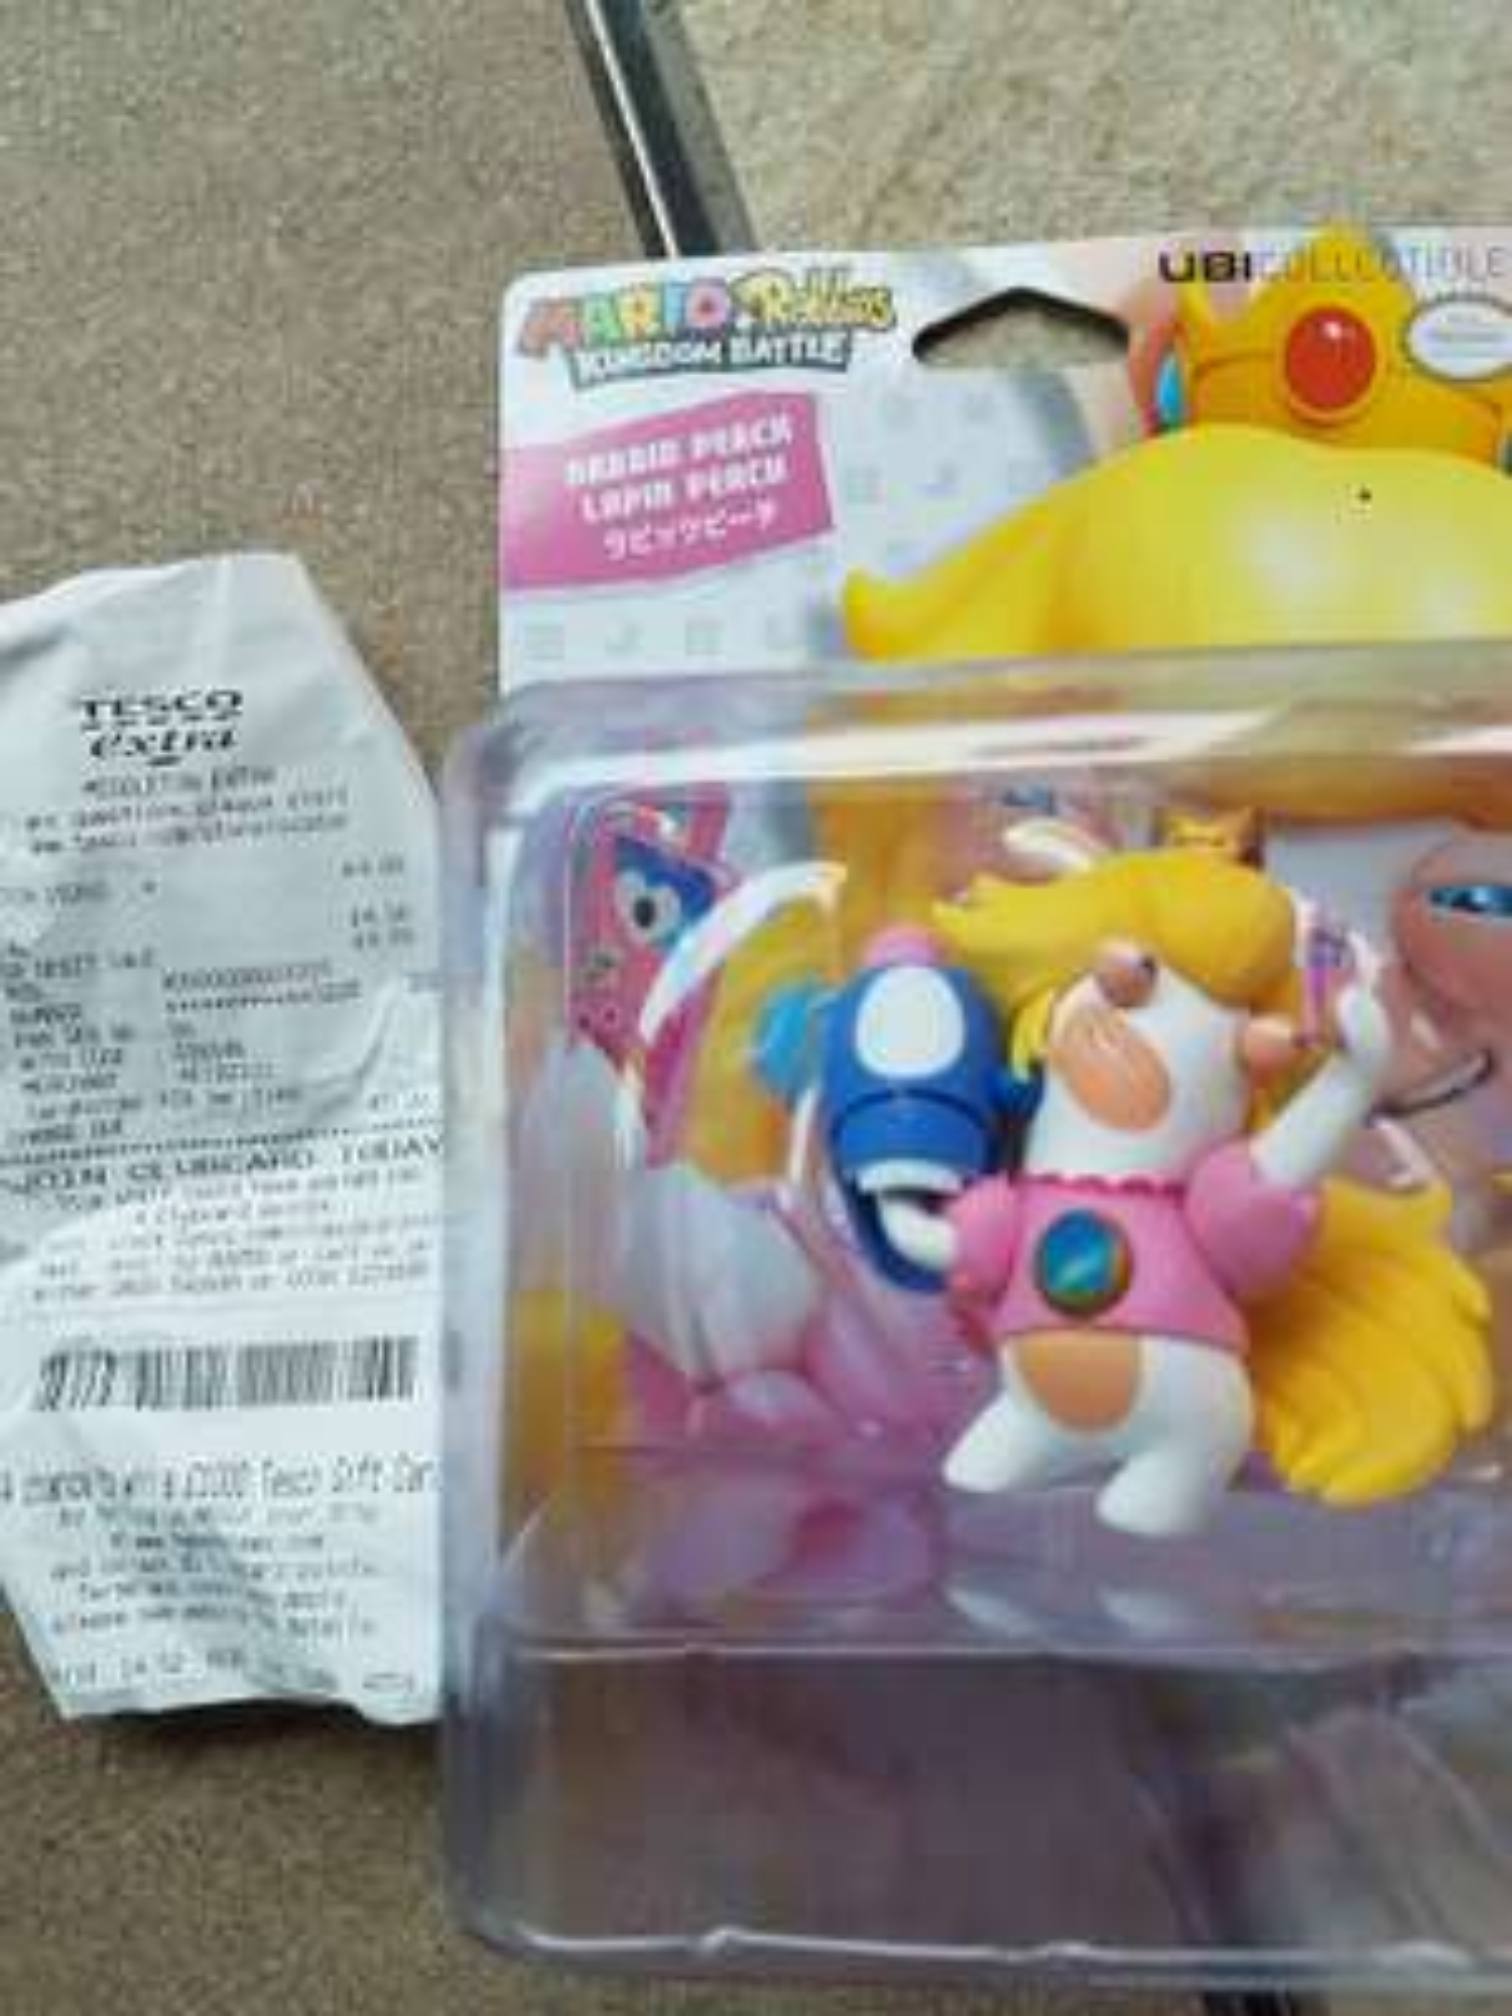 Mario + Rabbids Kingdom Battle Figures £4 (Tesco Middleton)